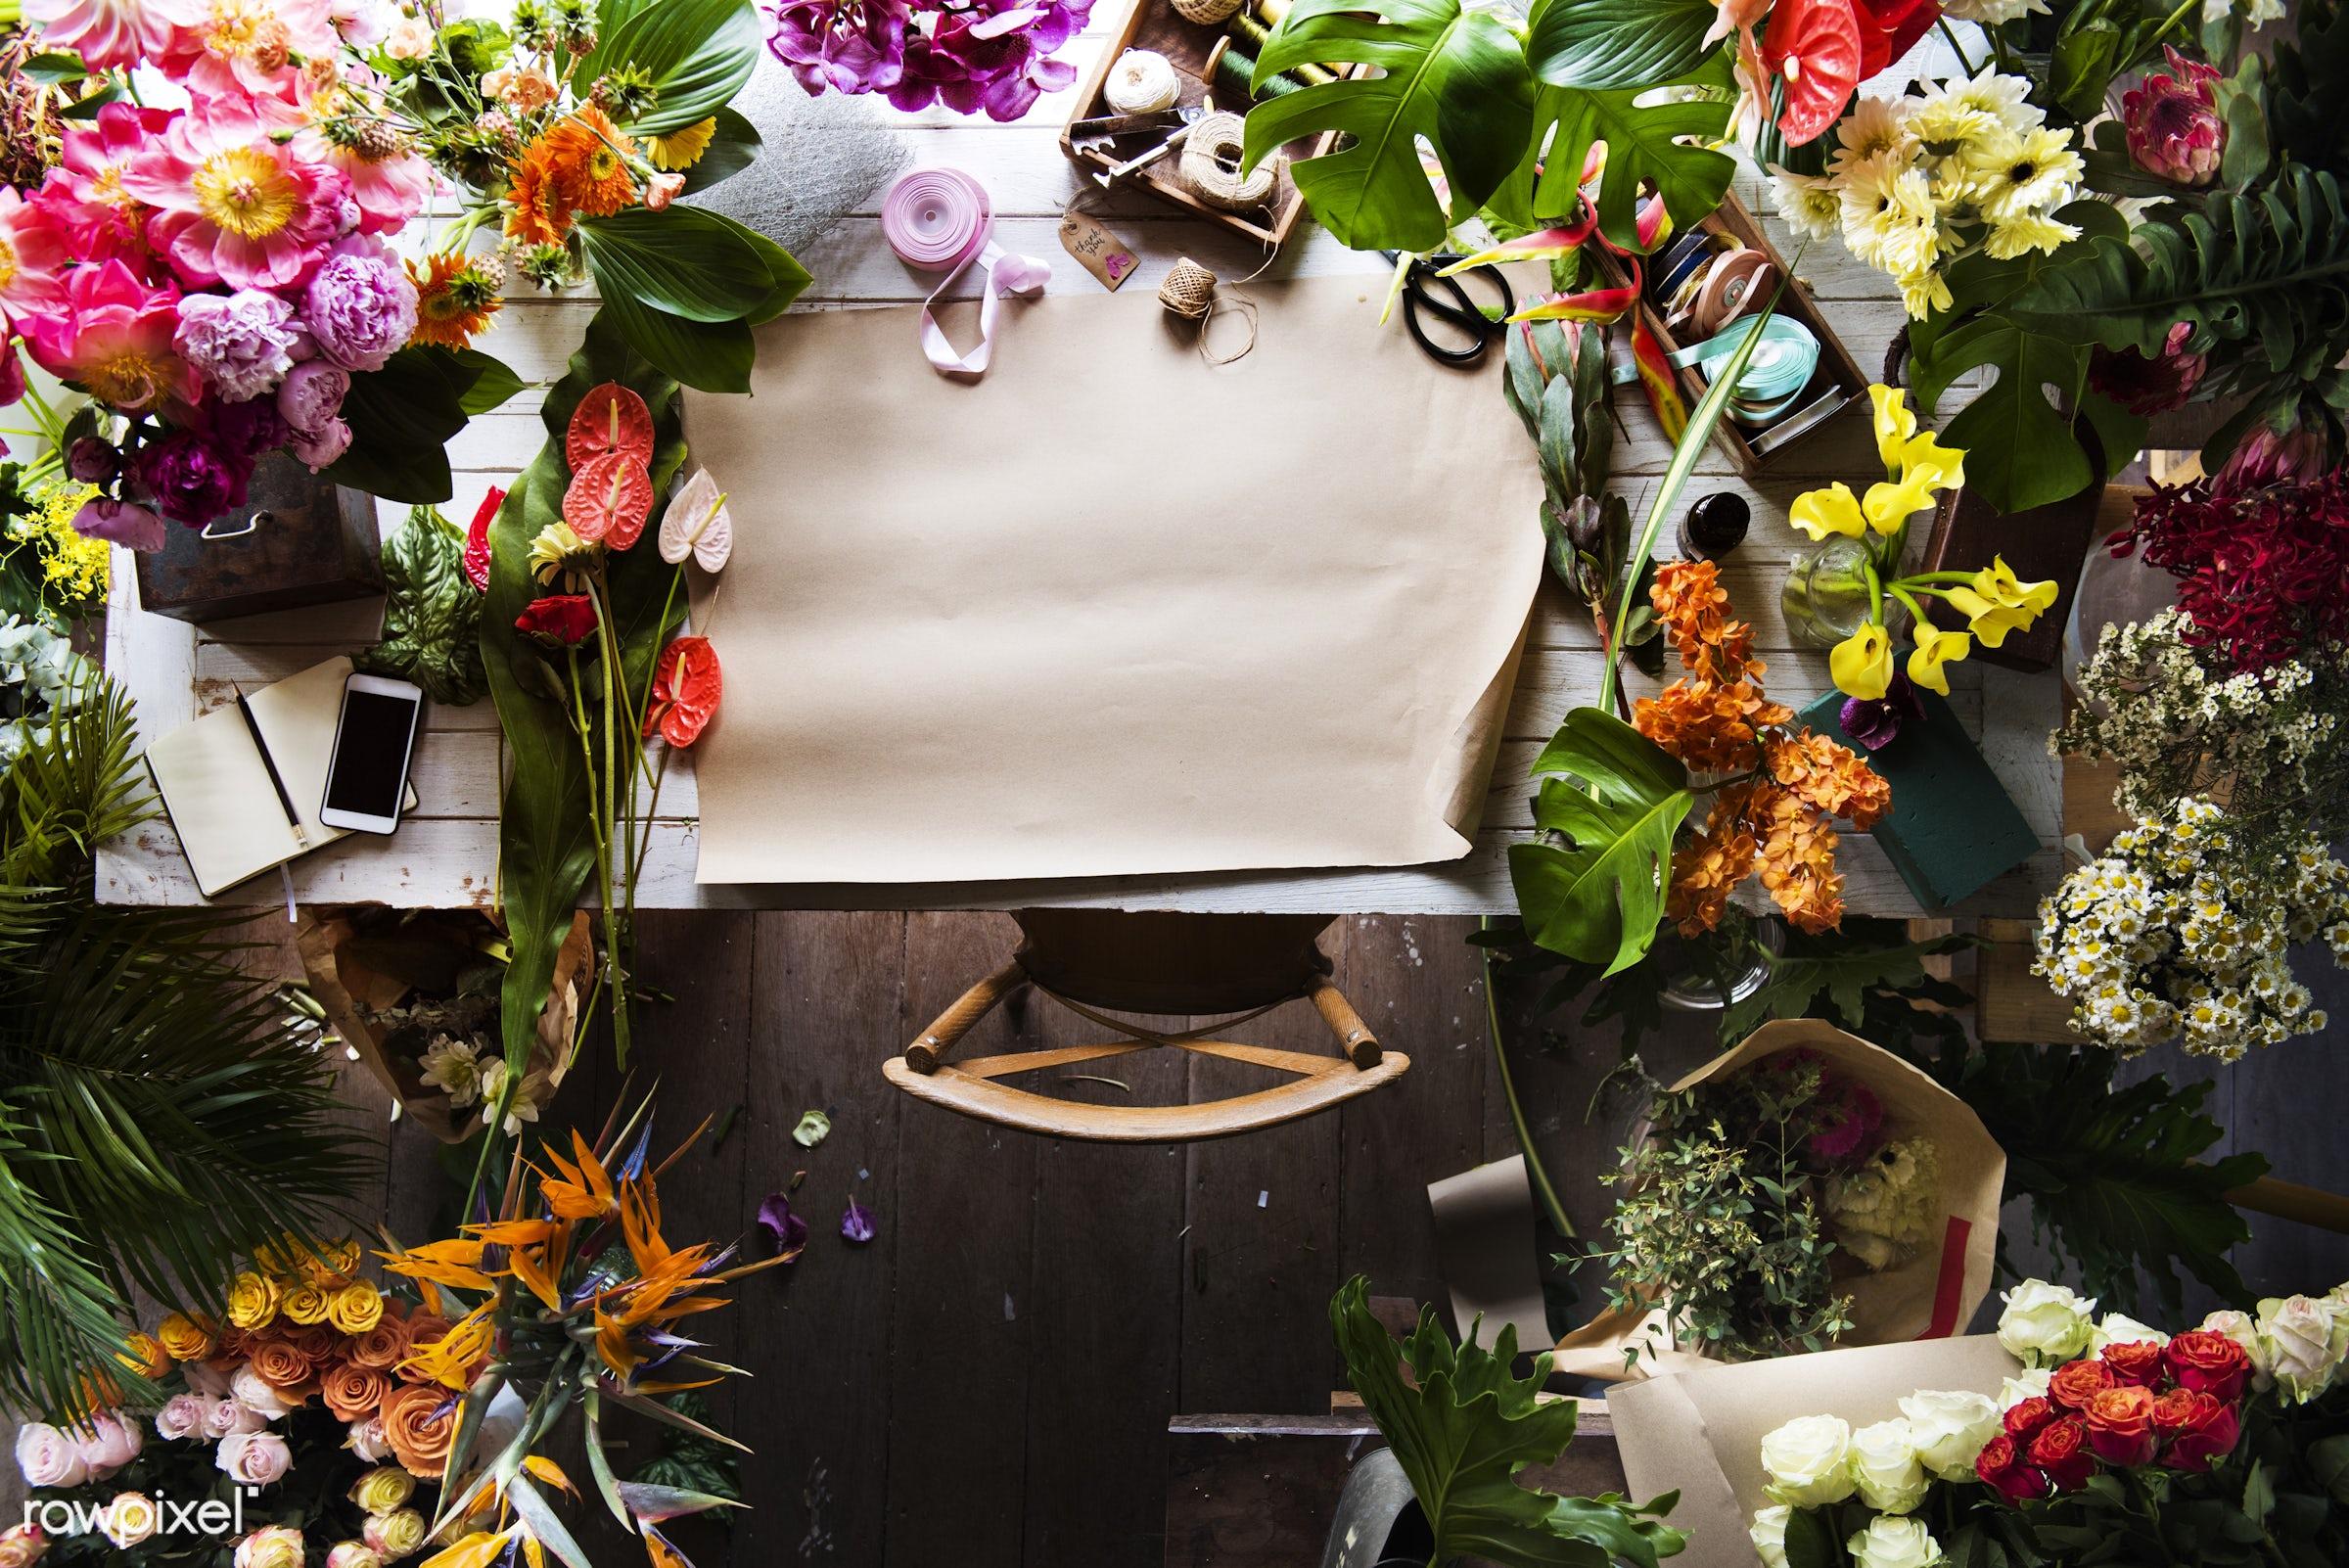 plant, copy space, fresh, mobile phone, aerial view, flower, blank, decoration, flora, refreshment, leisure, table, florist...